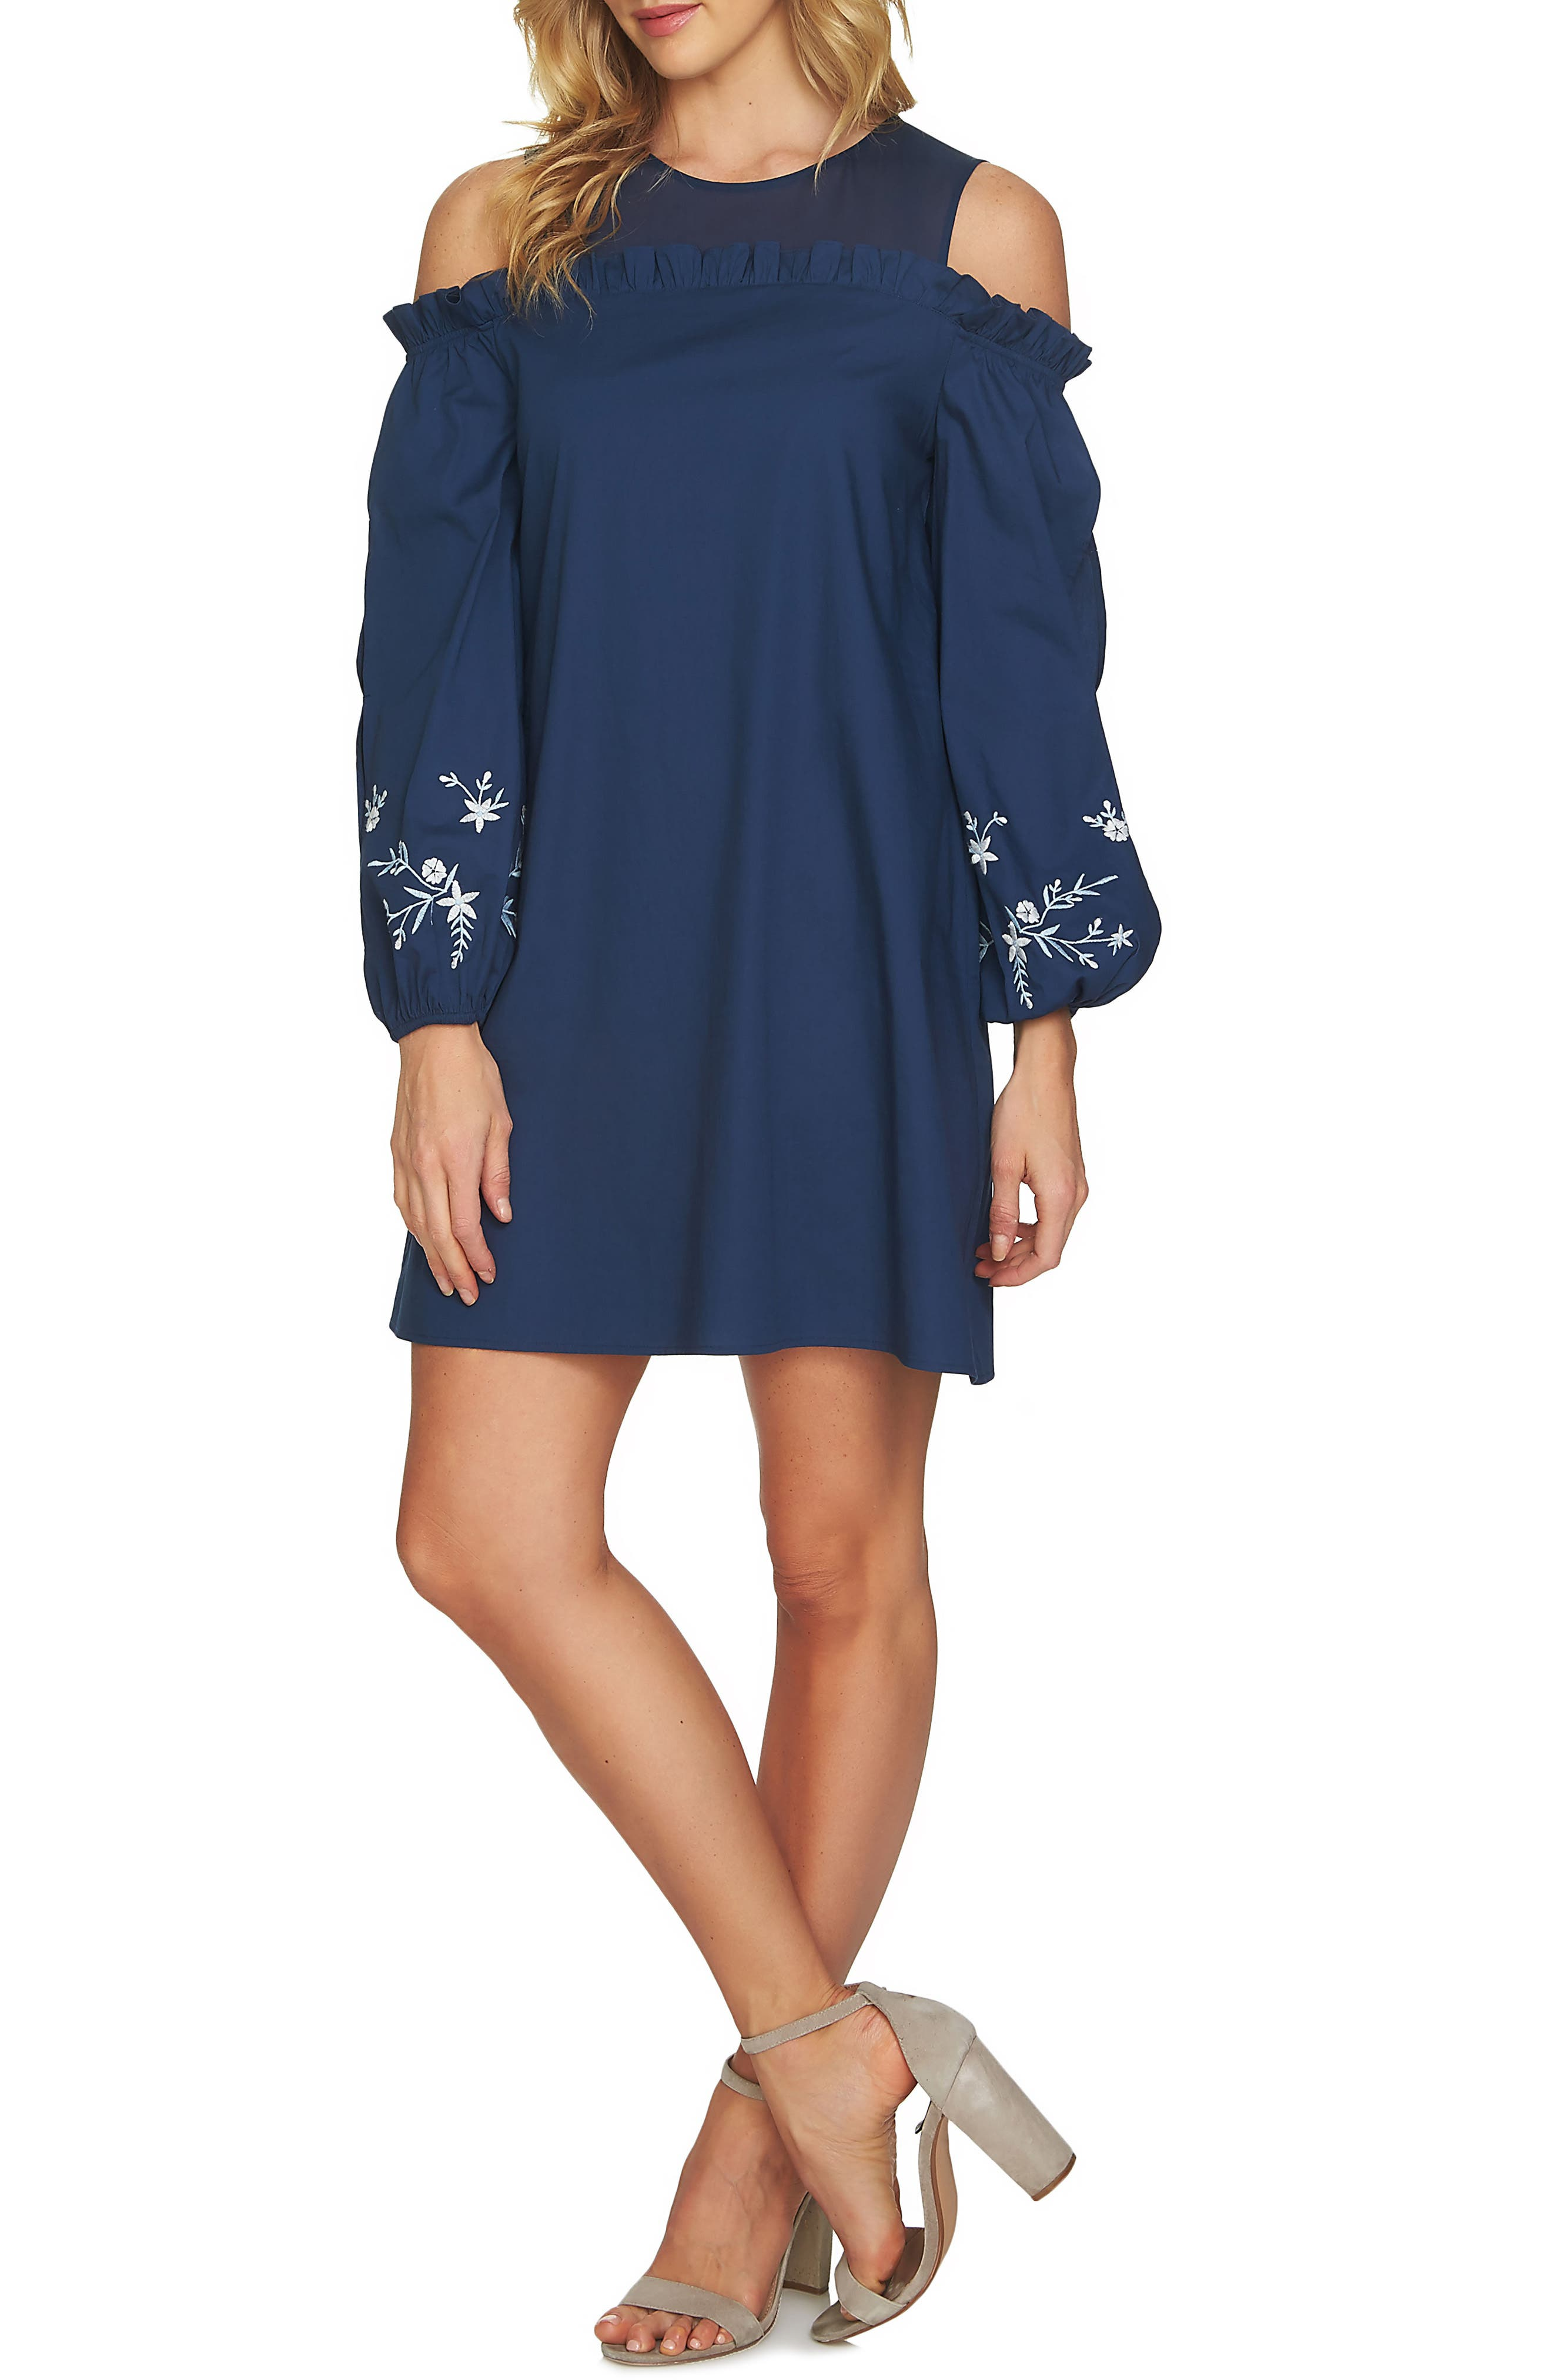 Cold Shoulder Embroidered Shift Dress,                             Main thumbnail 1, color,                             429